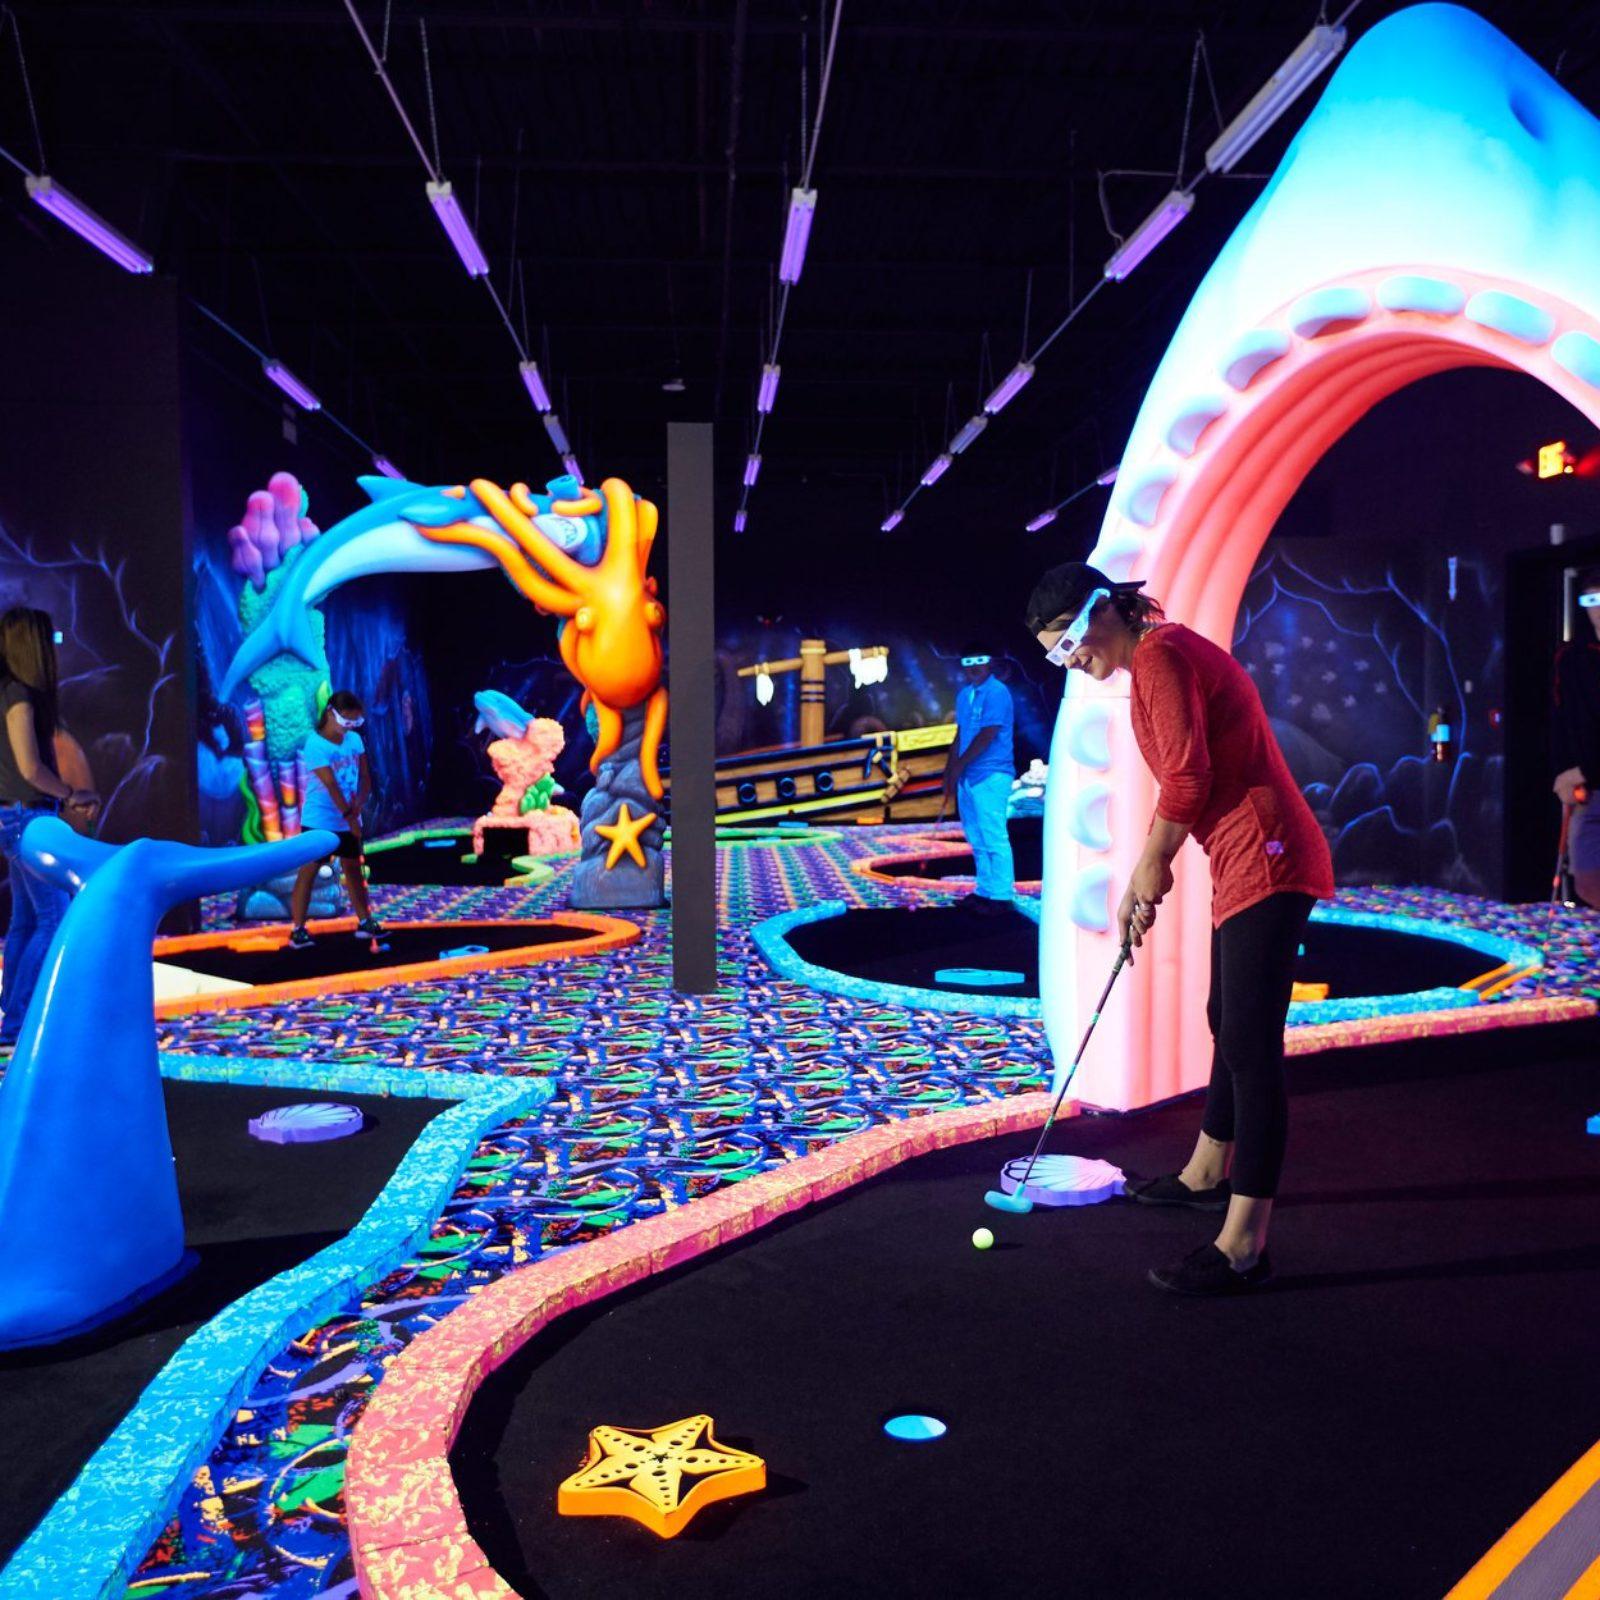 Largest Indoor Entertainment Center In